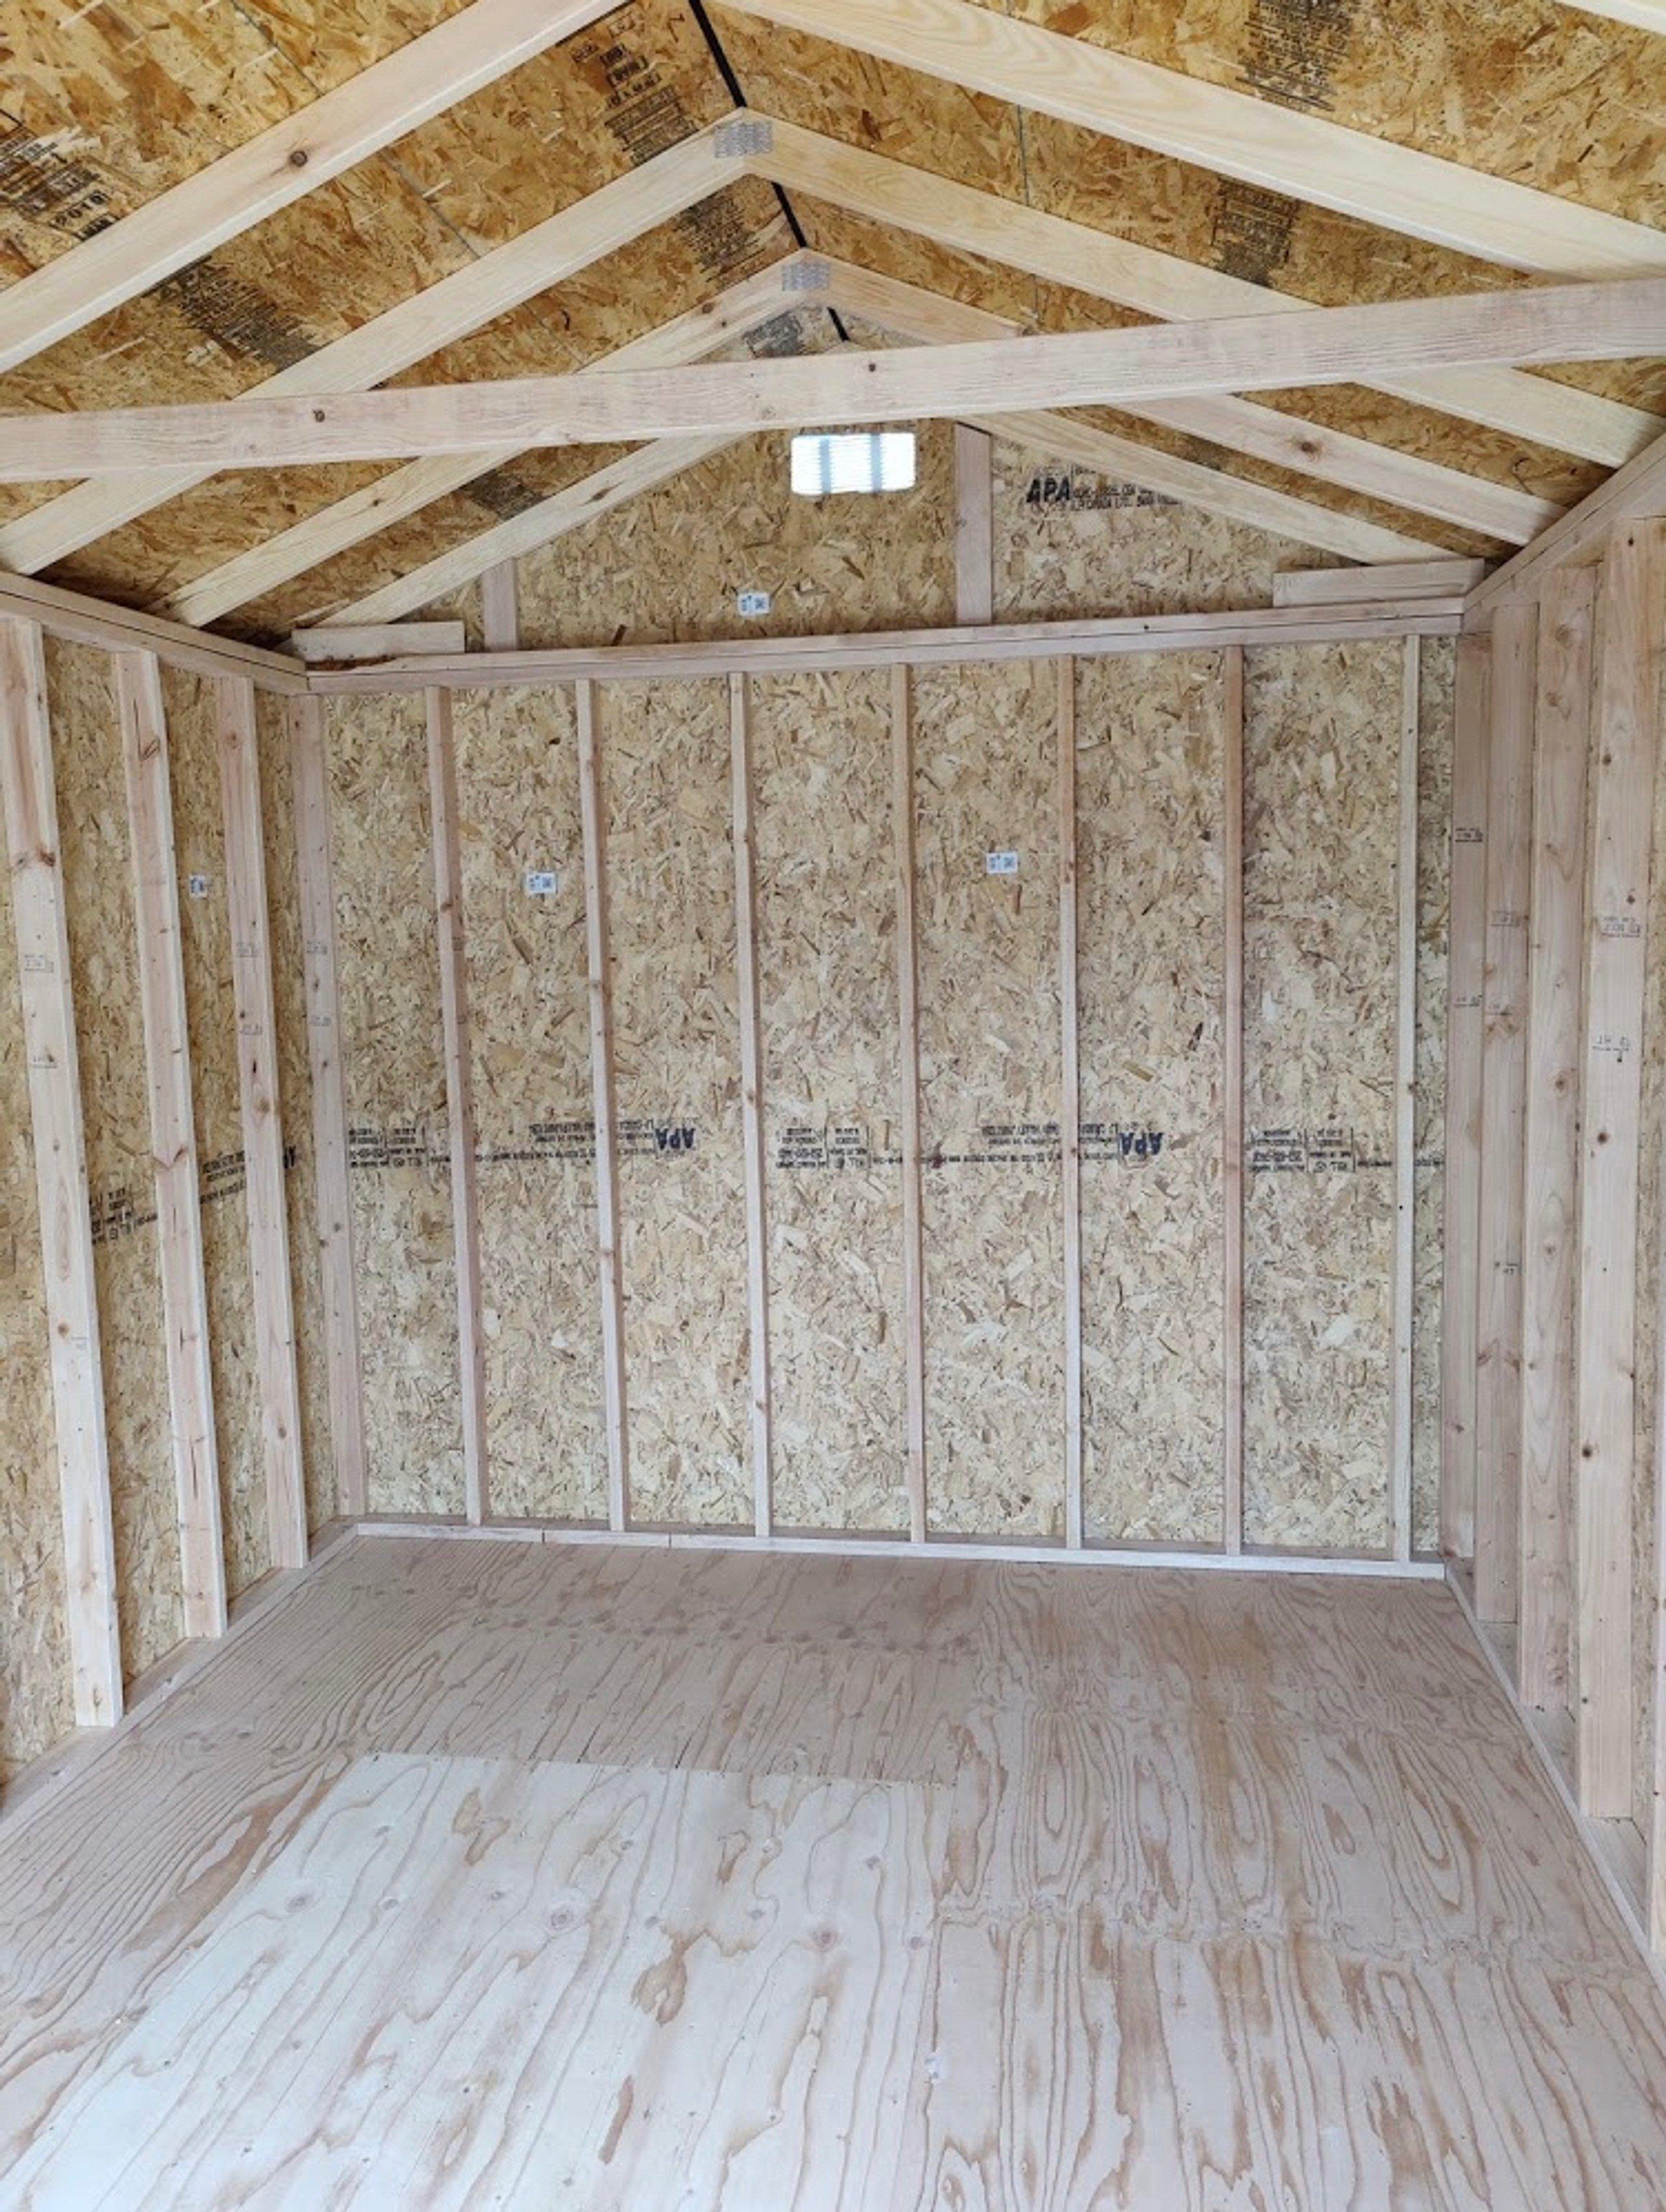 20x8 Shed self storage unit